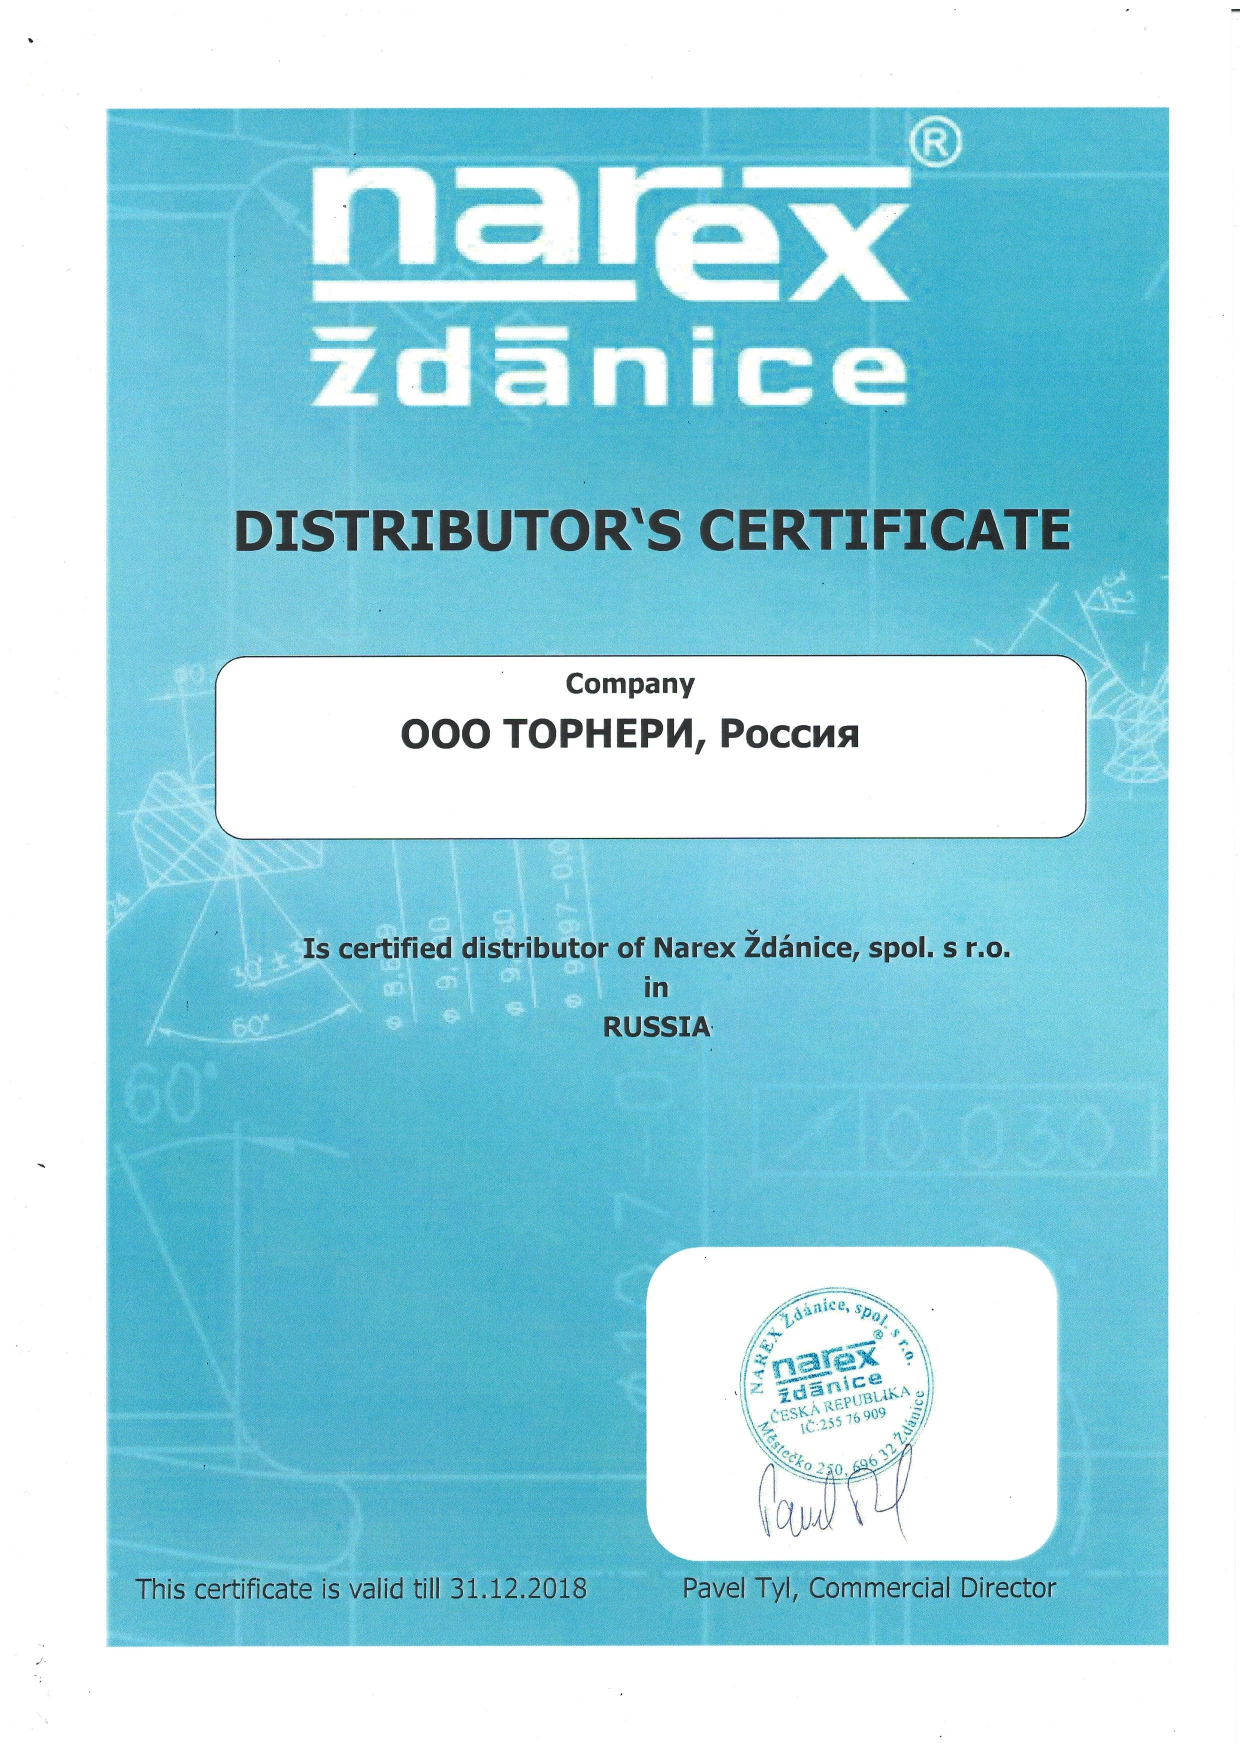 Сертификат дистрибьютора Narex